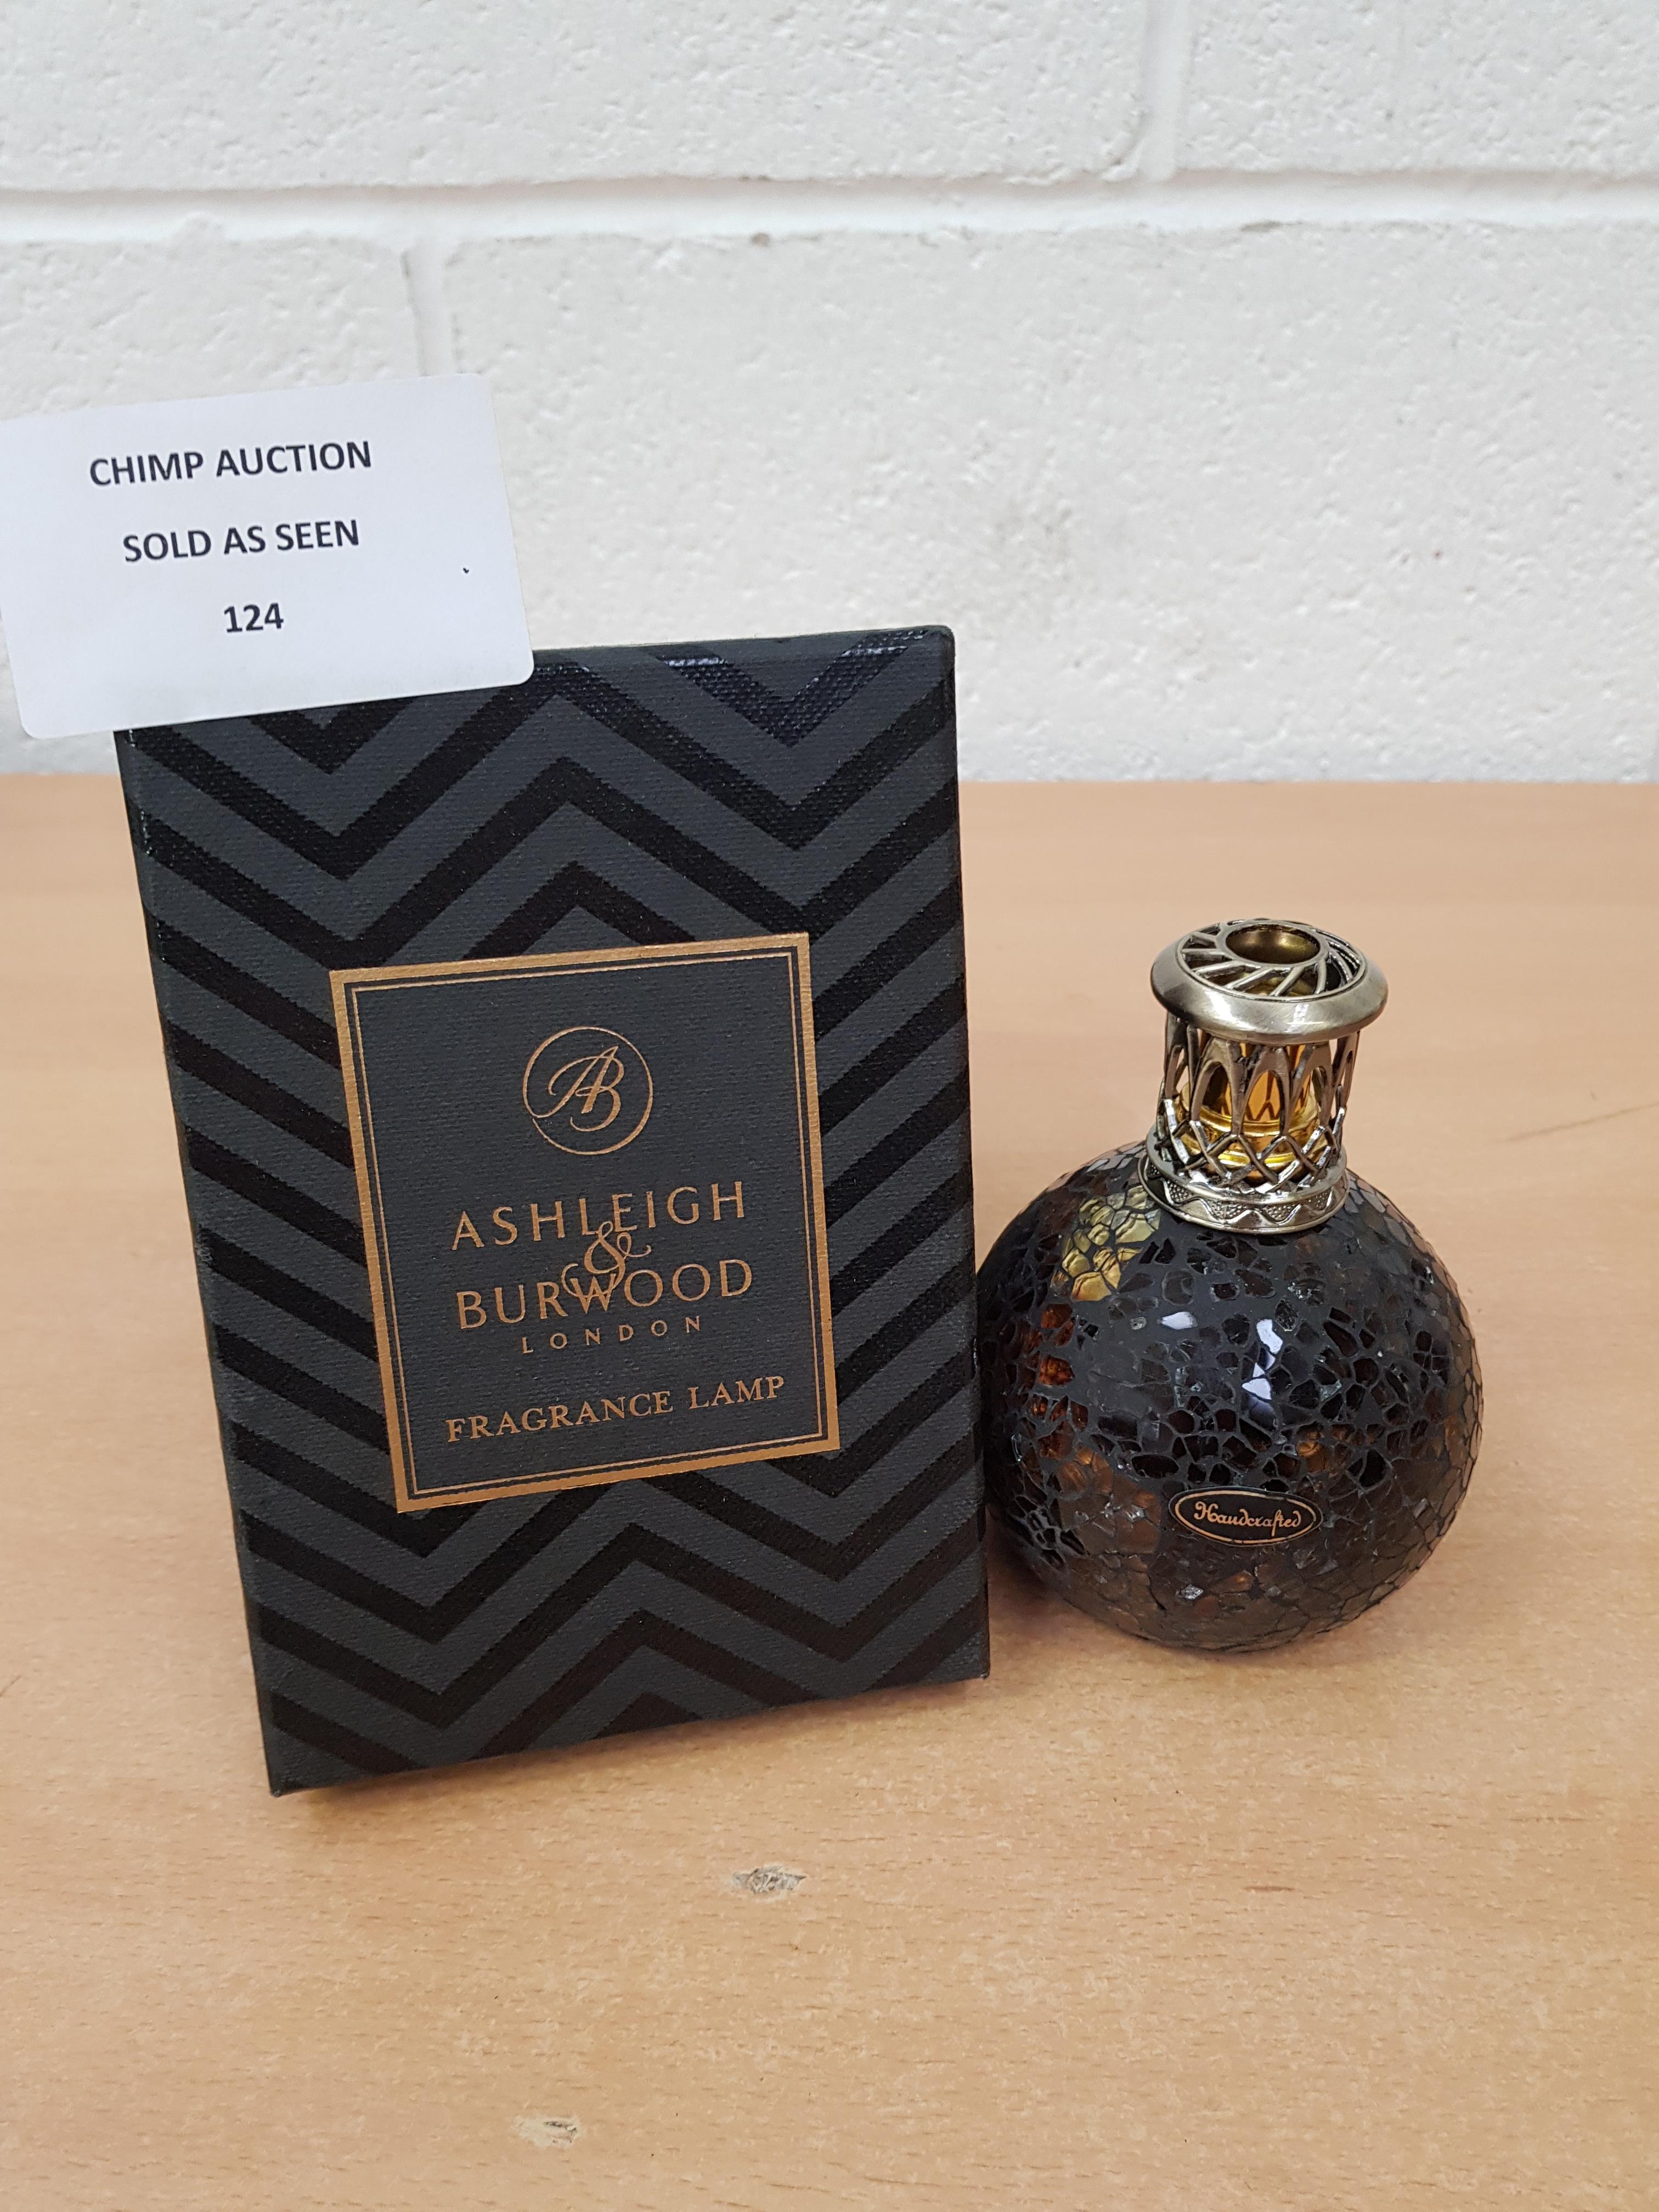 Lot 124 - Ashleigh & Burwood London Fragrance Lamp